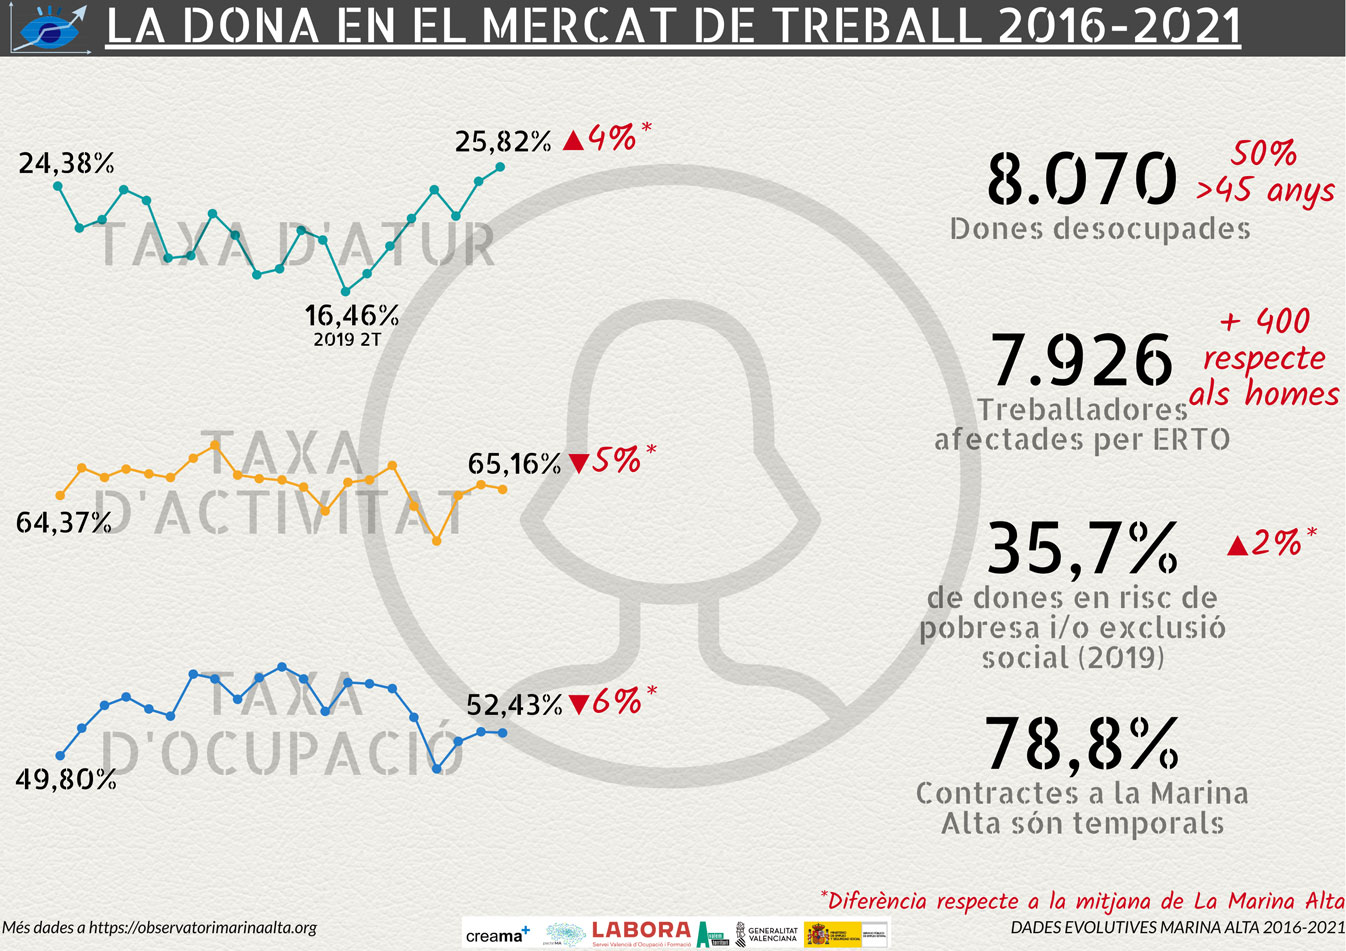 L'Observatori Marina Alta publica un informe sobre el papel de la mujer en el mercado laboral en la comarca.